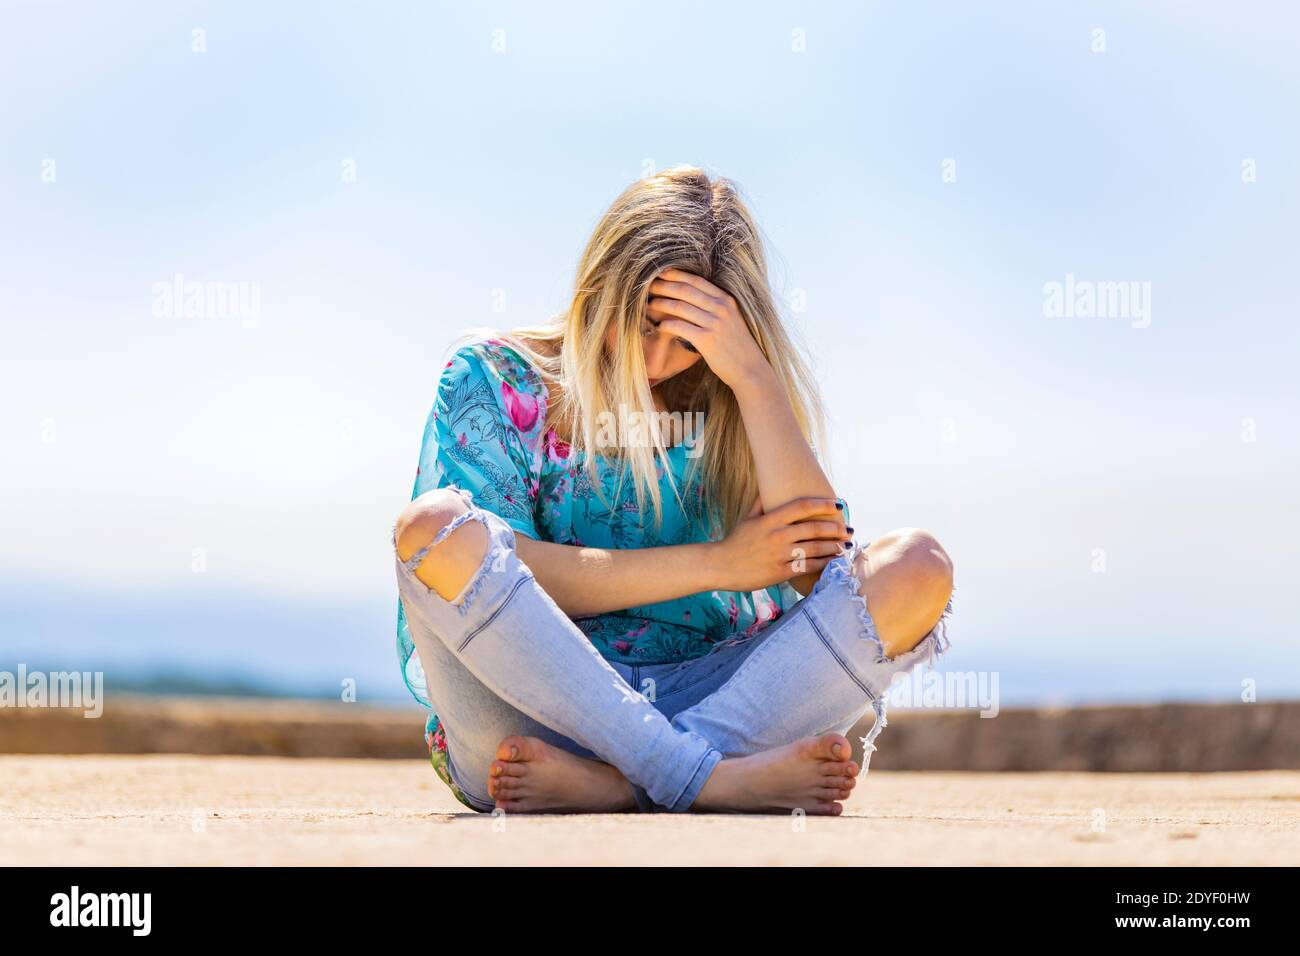 Blonde teengirl sitting on ground street crossed legs cross legged barefeet bare-feet wearing ripped denim denims pants low view Stock Photo